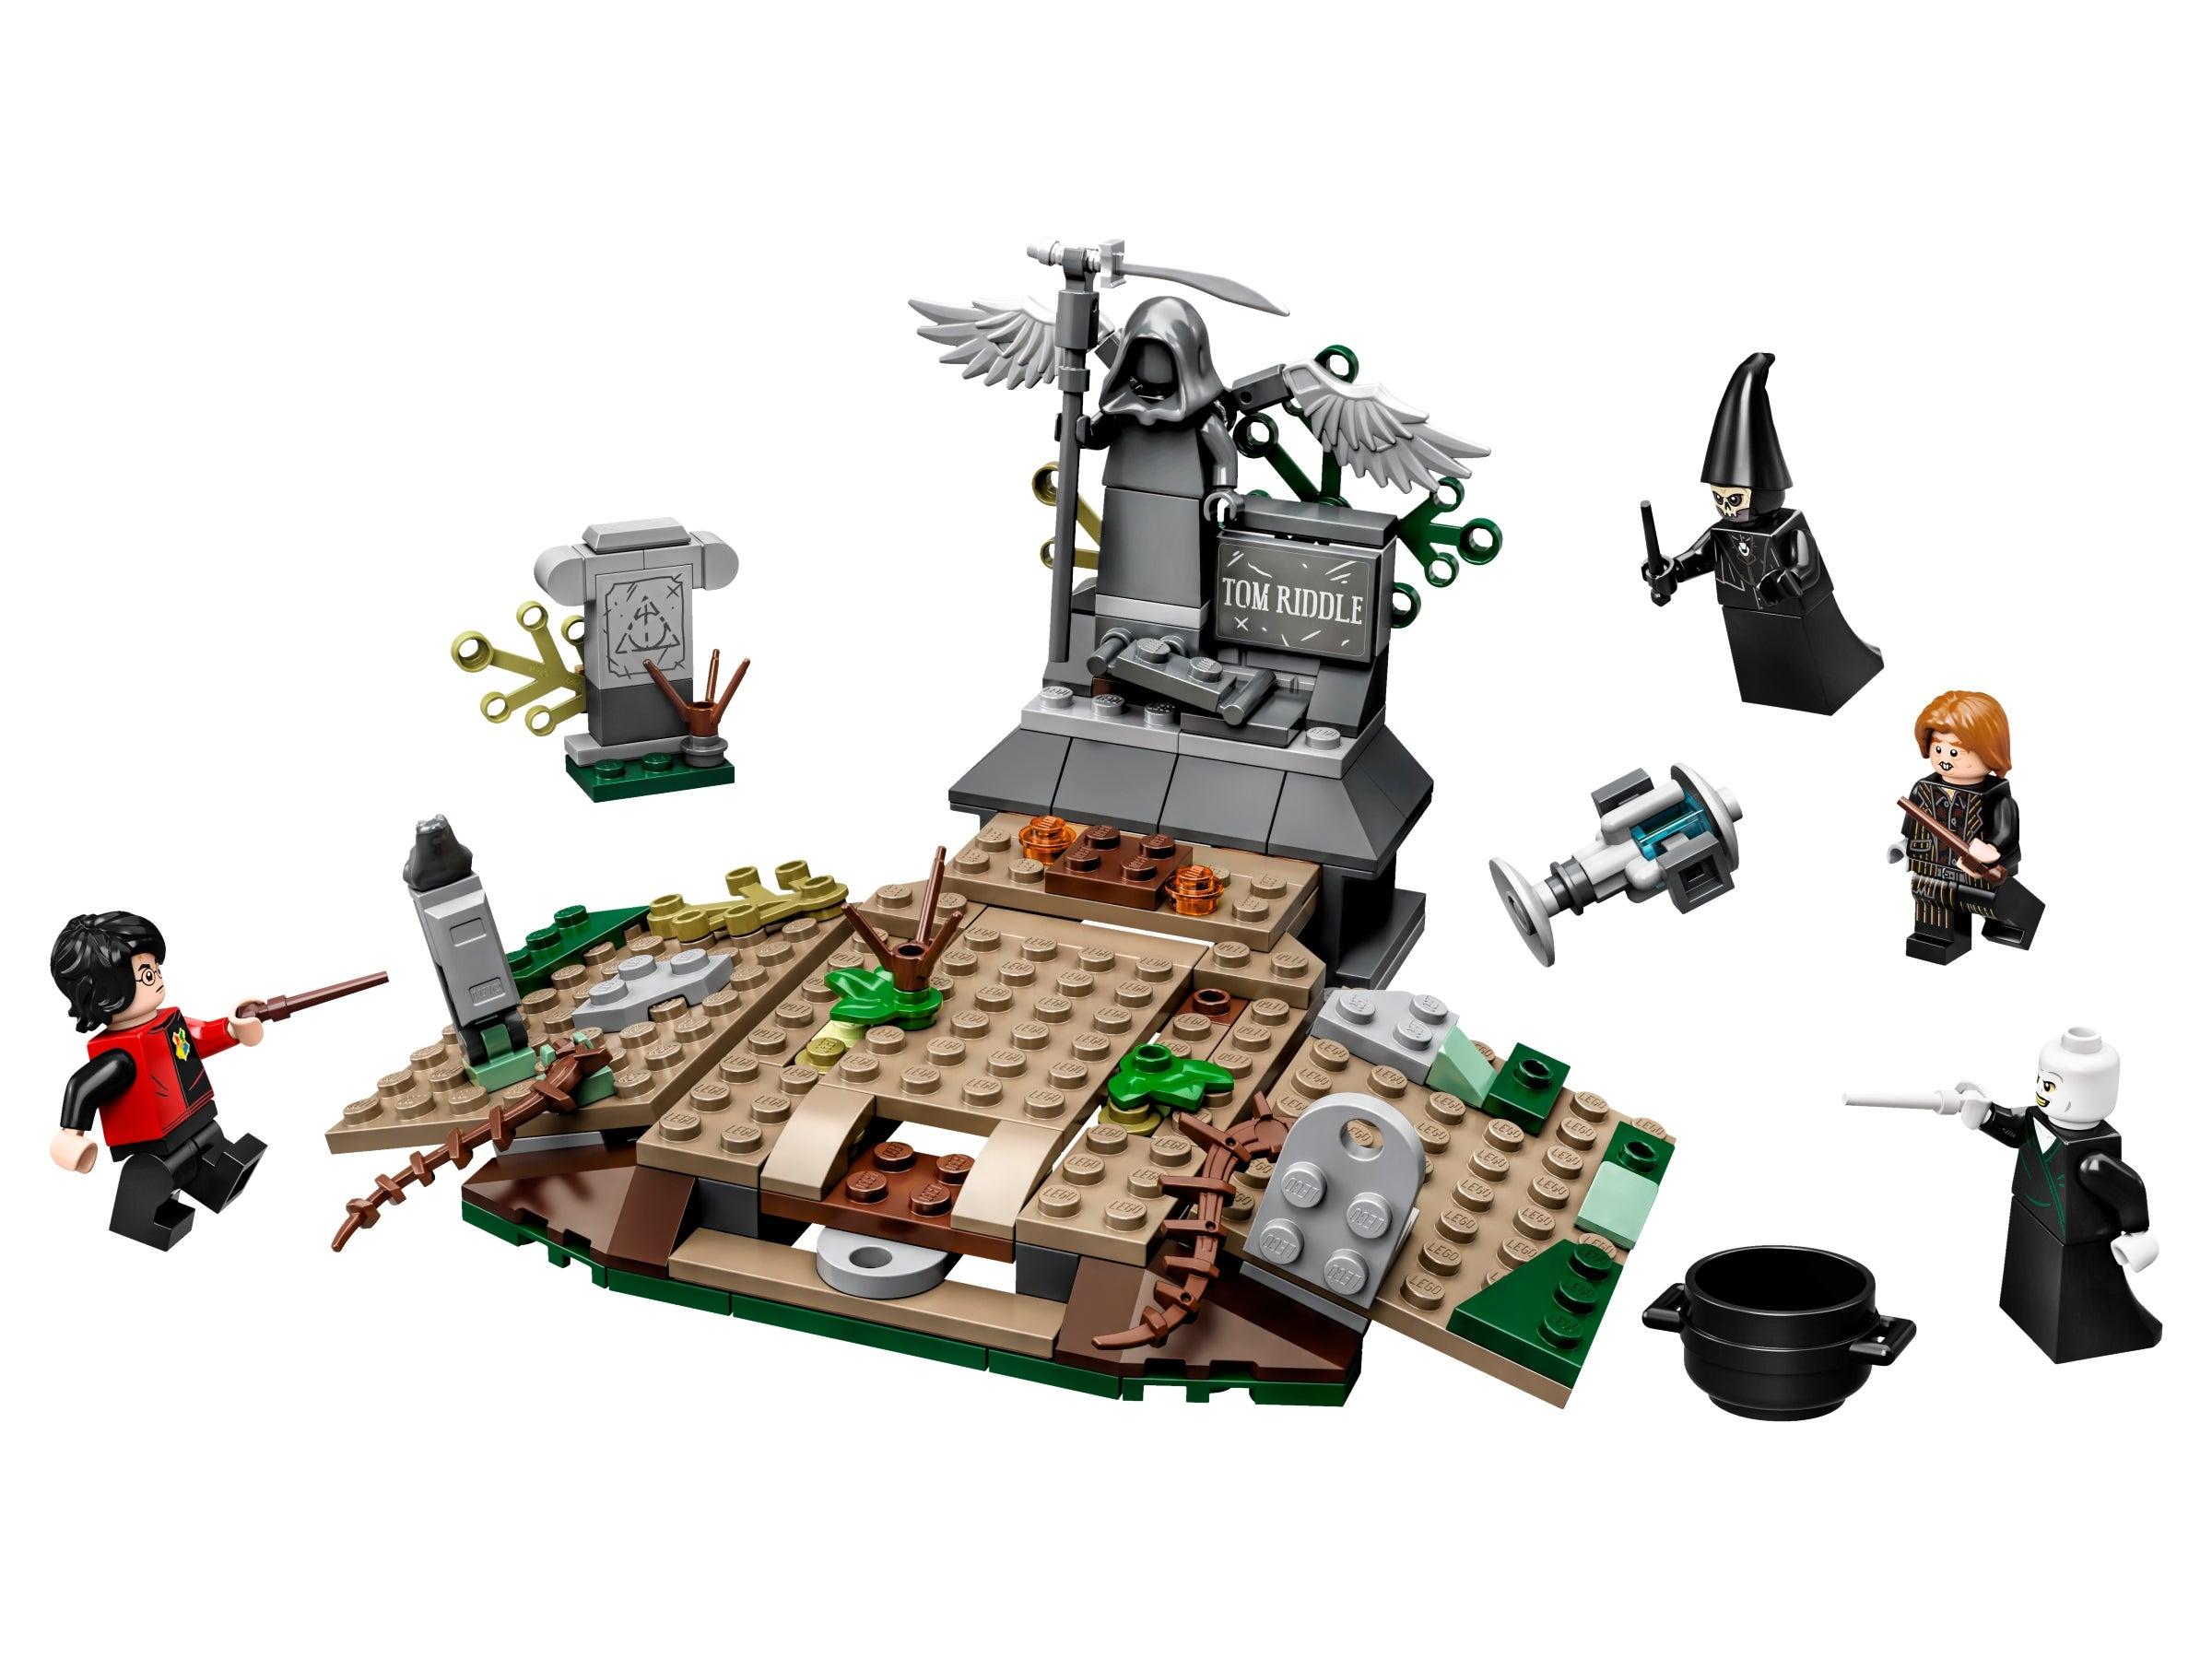 Genuine LEGO Harry Potter Baby Voldemort figurine #hp194 from set 75965